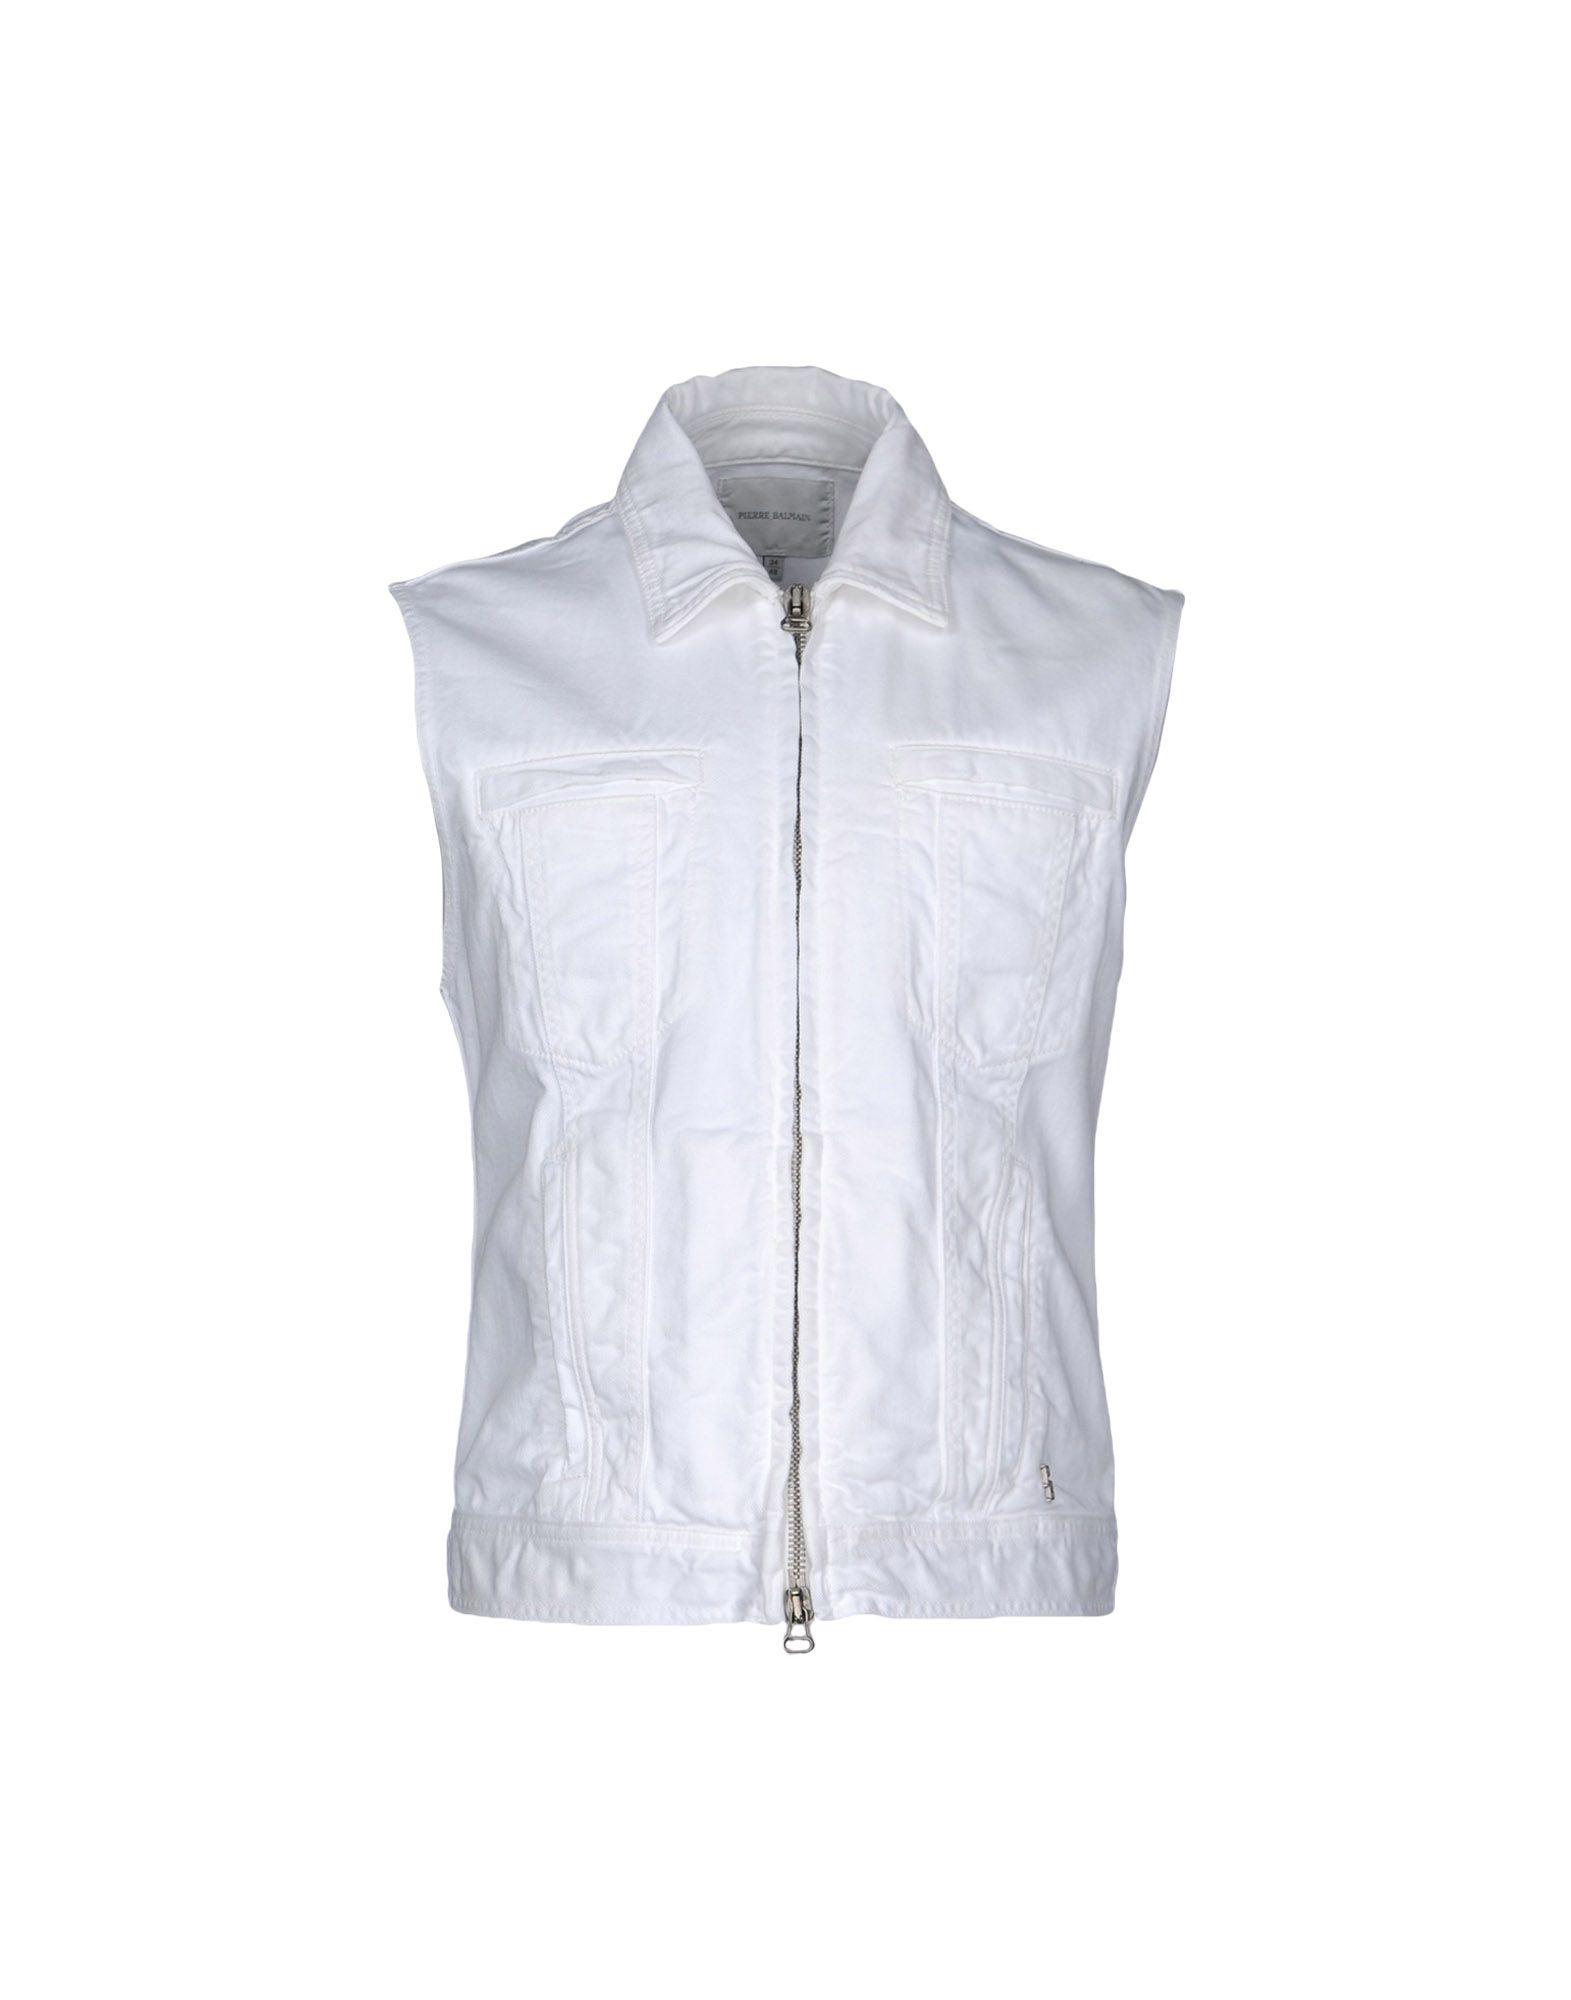 PIERRE BALMAIN Джинсовая верхняя одежда верхняя одежда